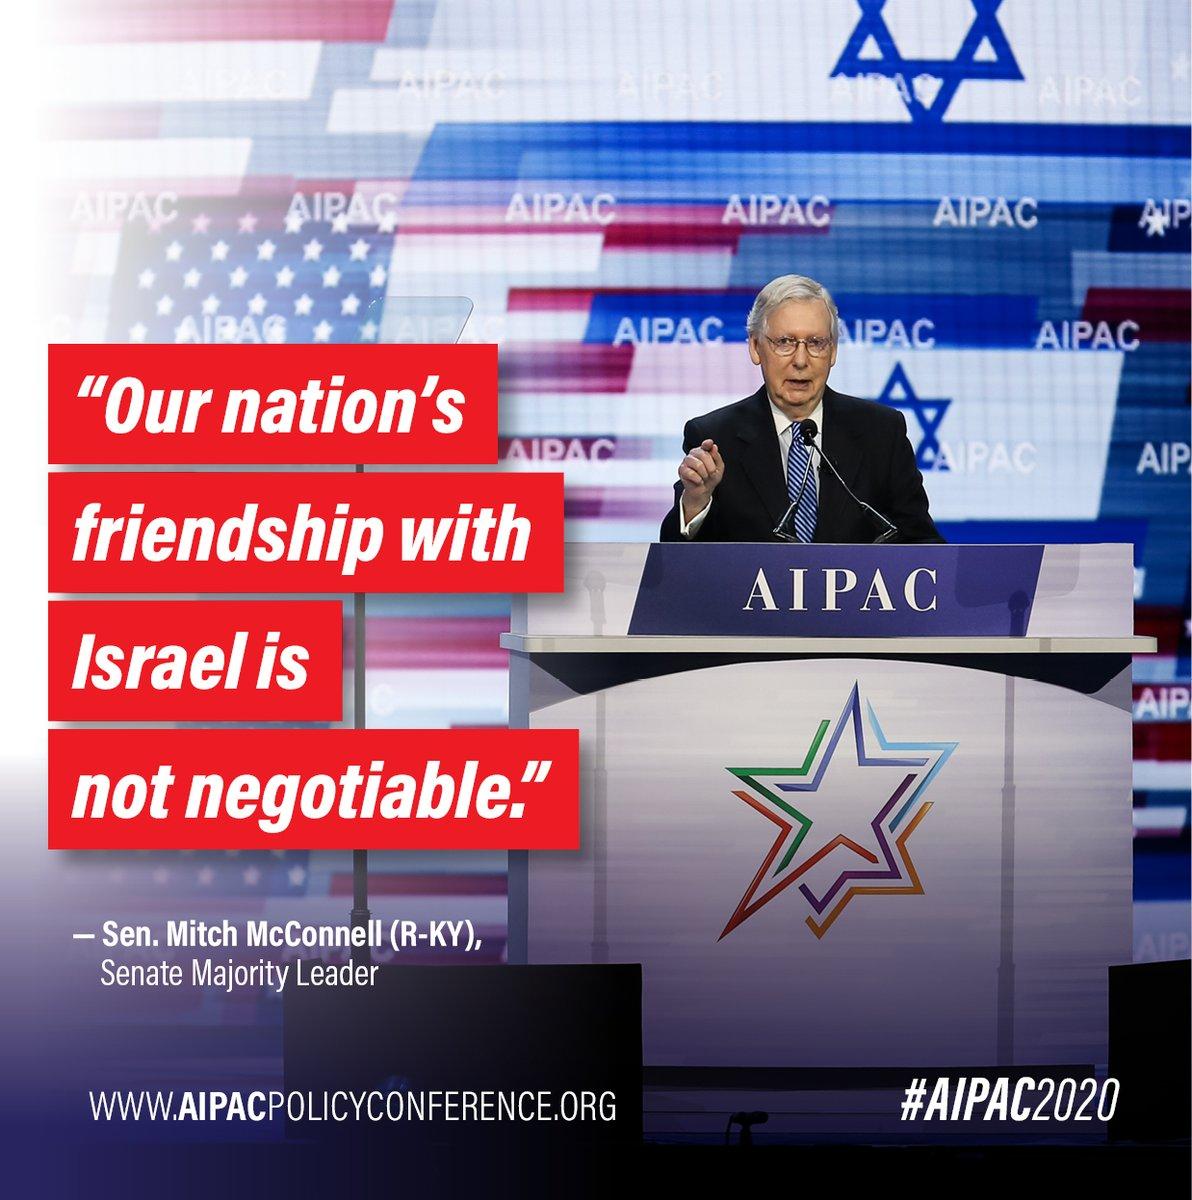 Thank you, @senatemajldr! #AIPACProud